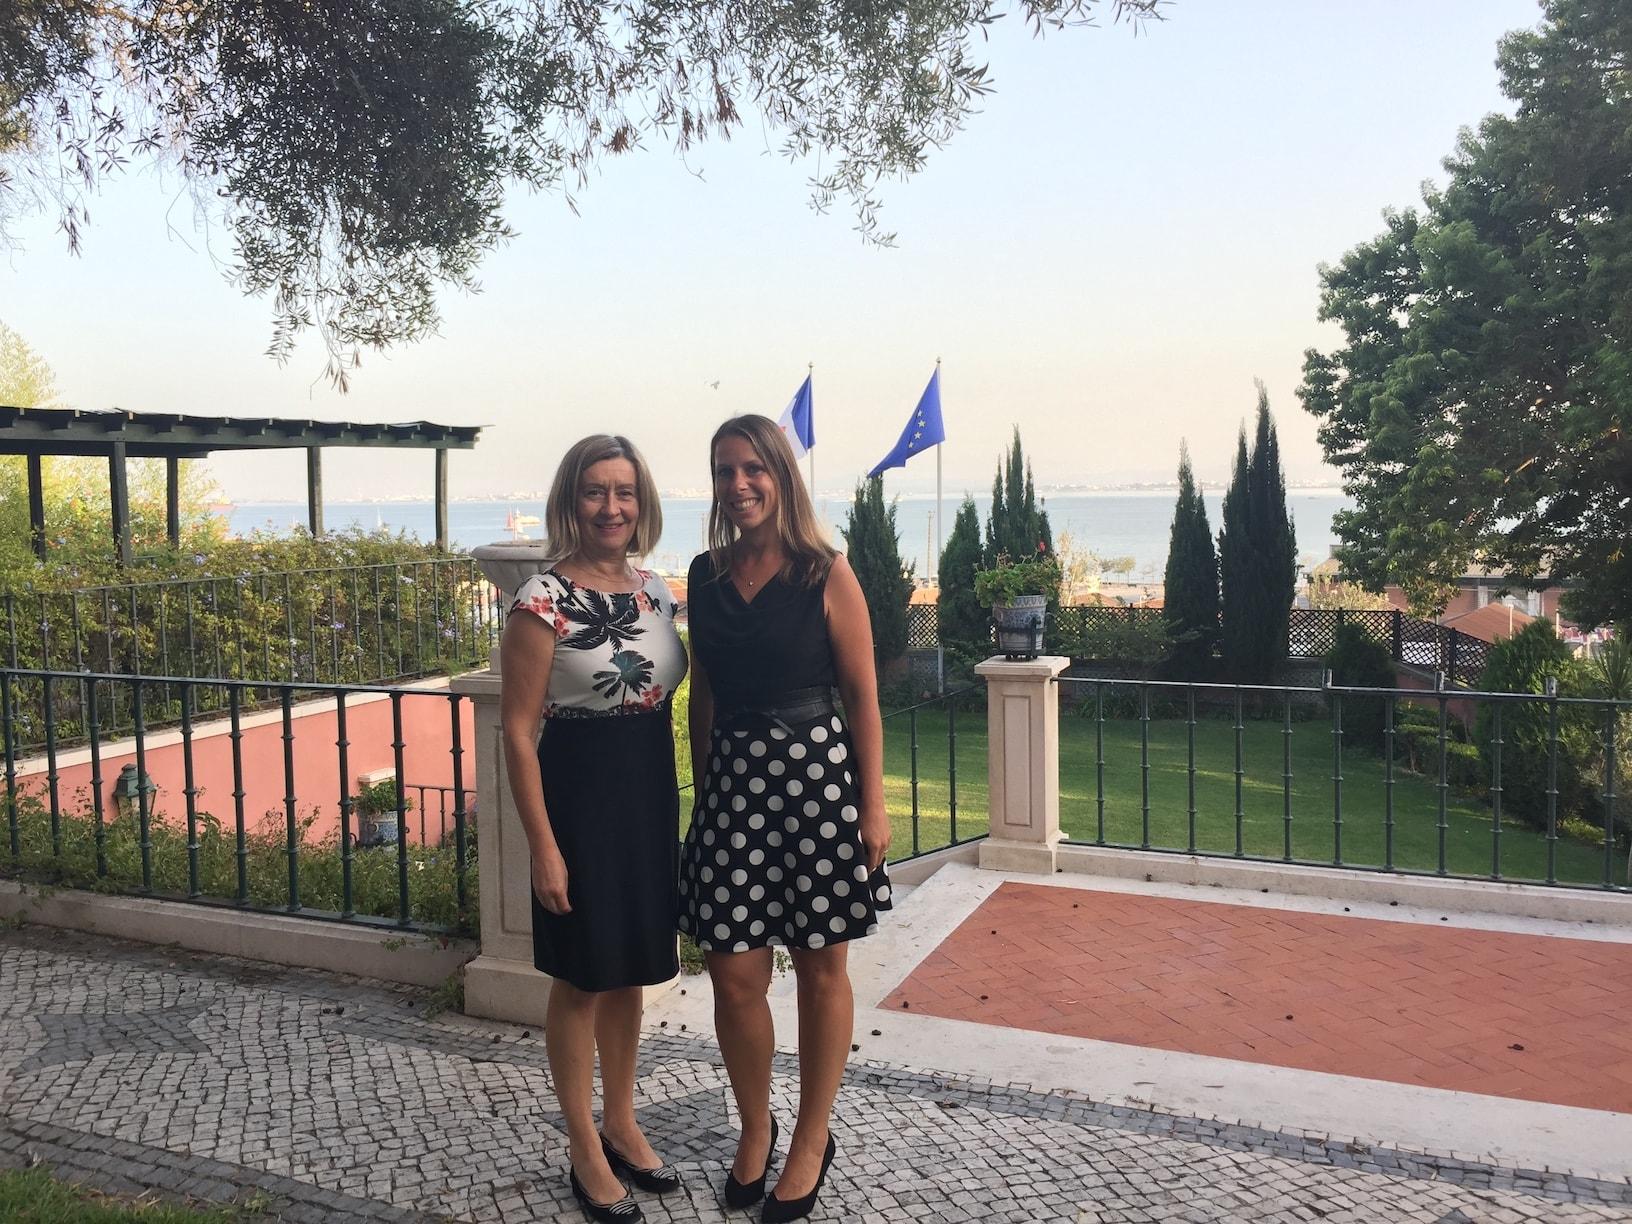 Salon entreprendre Portugal ambassade de France Virginie et Senatrice